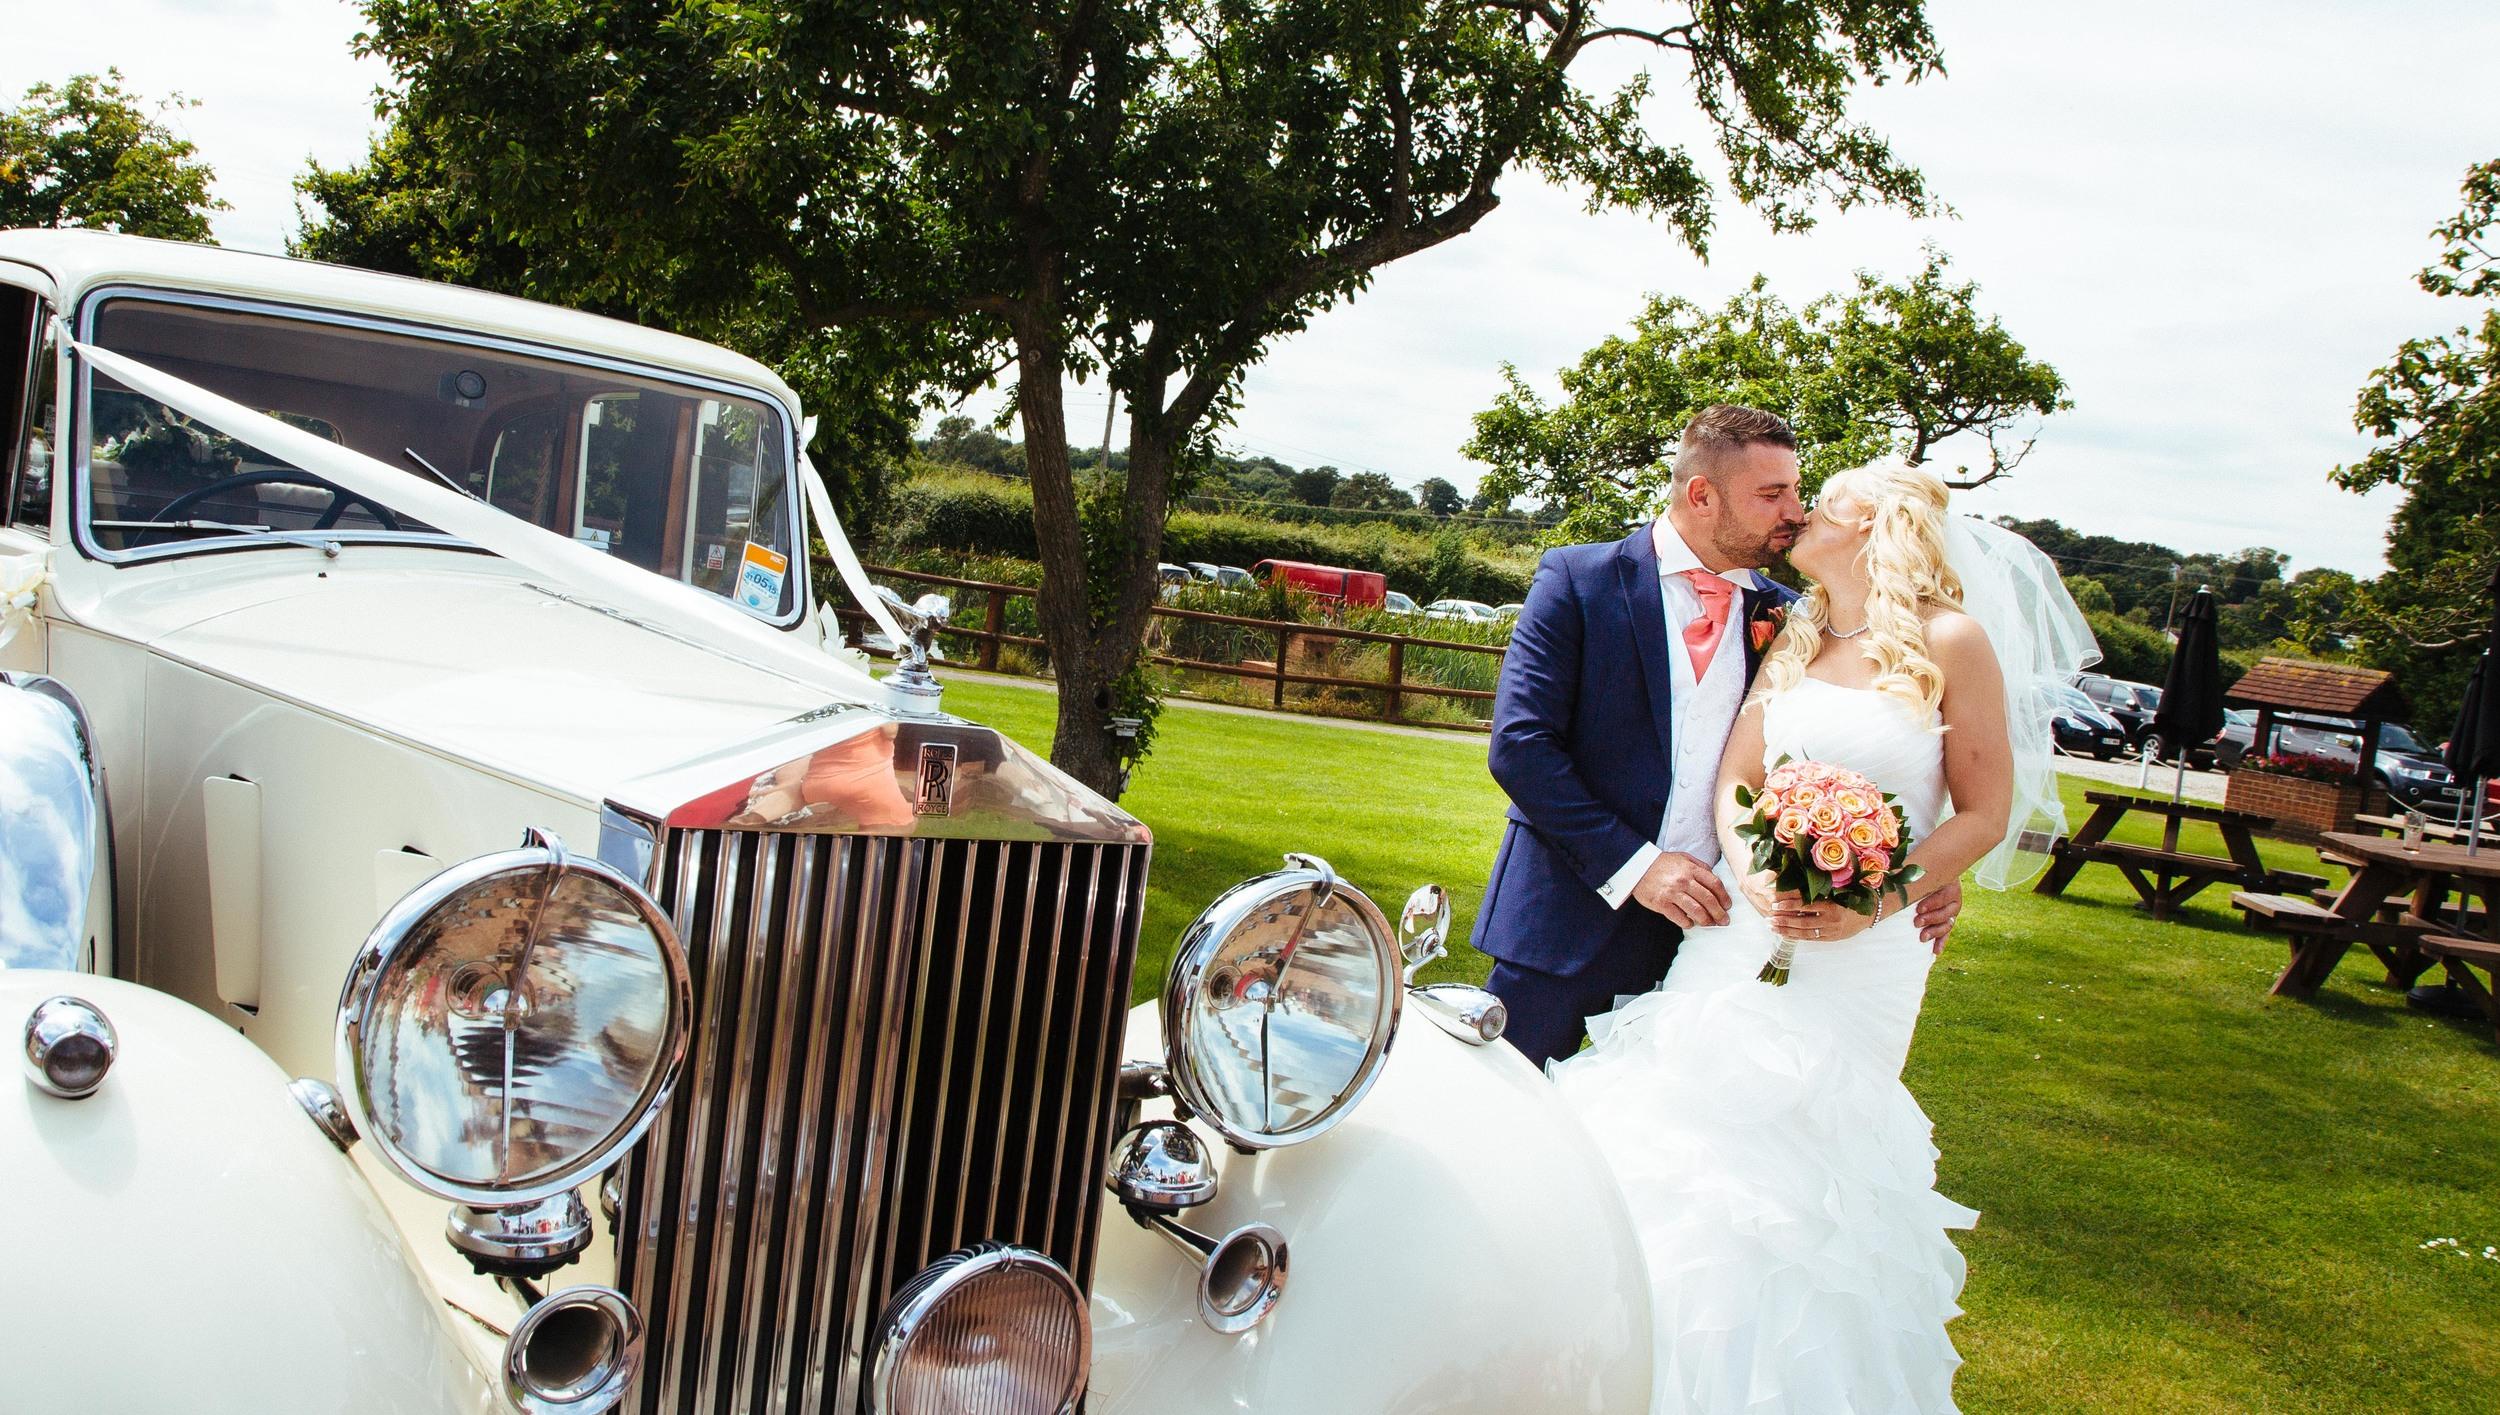 Essex-countryside-wedding-summer-kissing